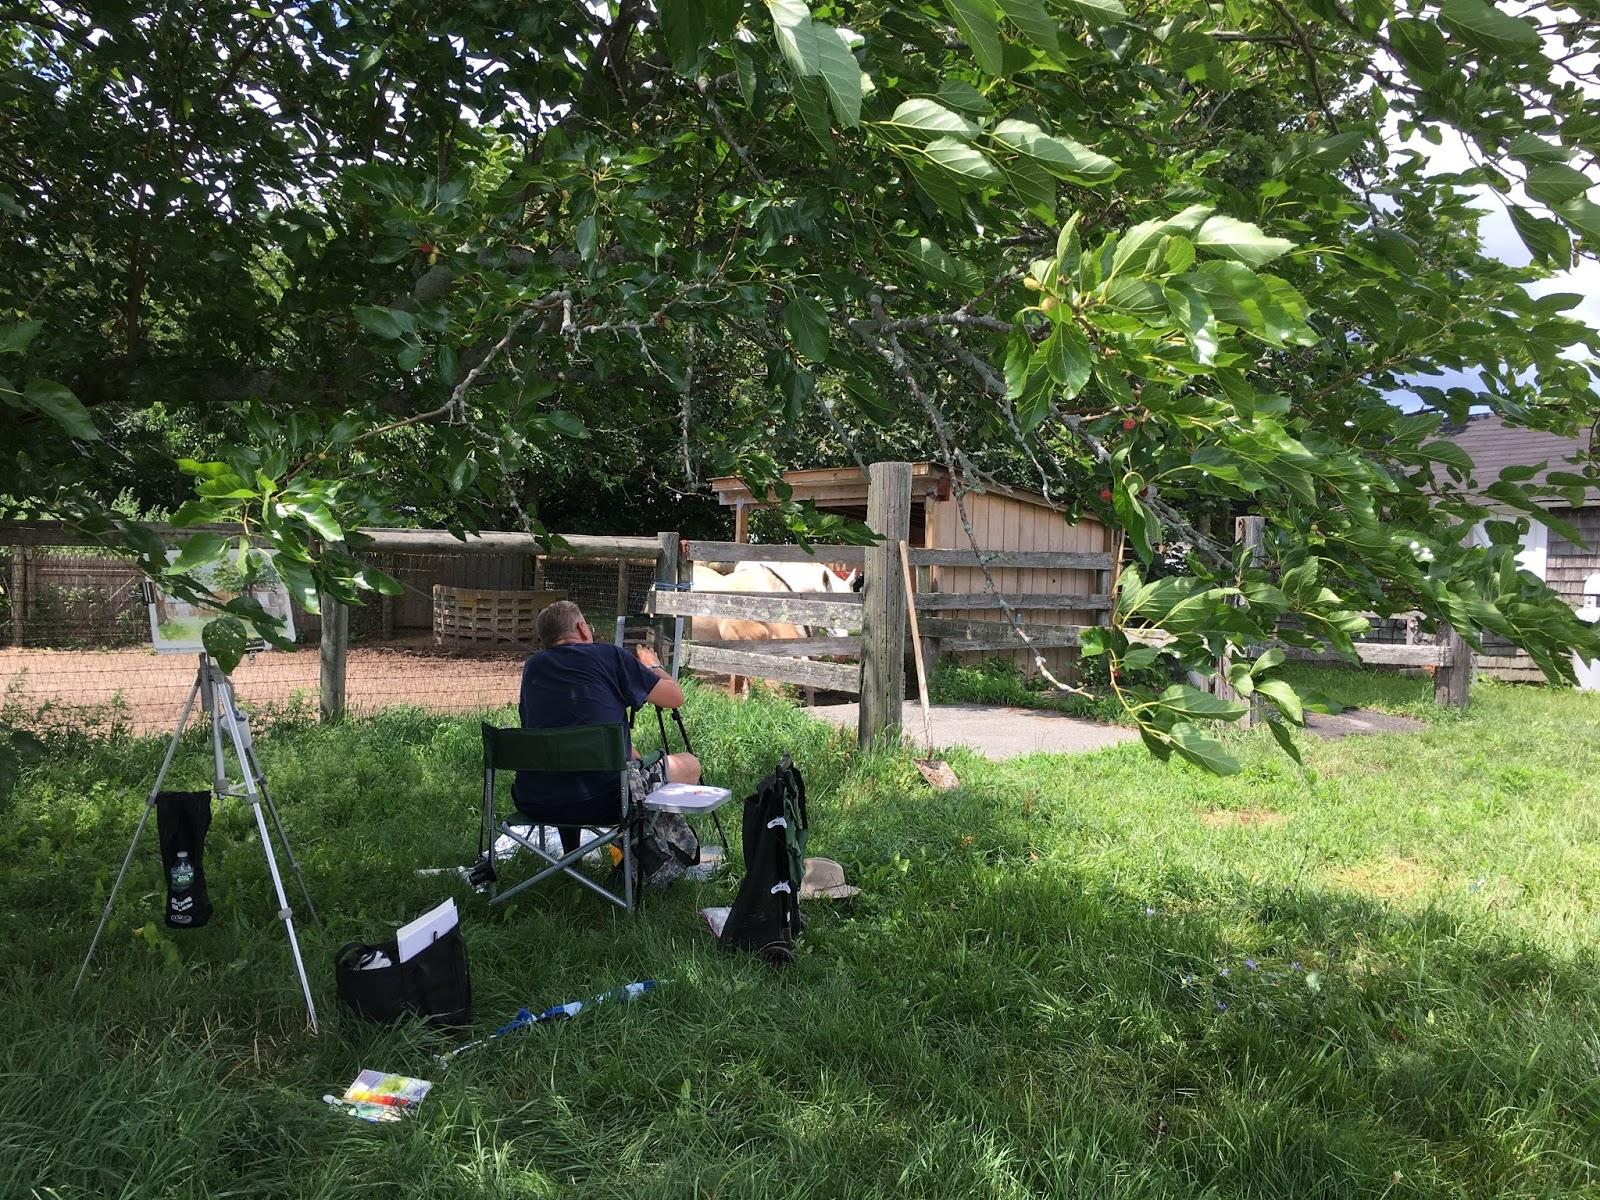 pals plein air limner society north quarter farm 7 18 17